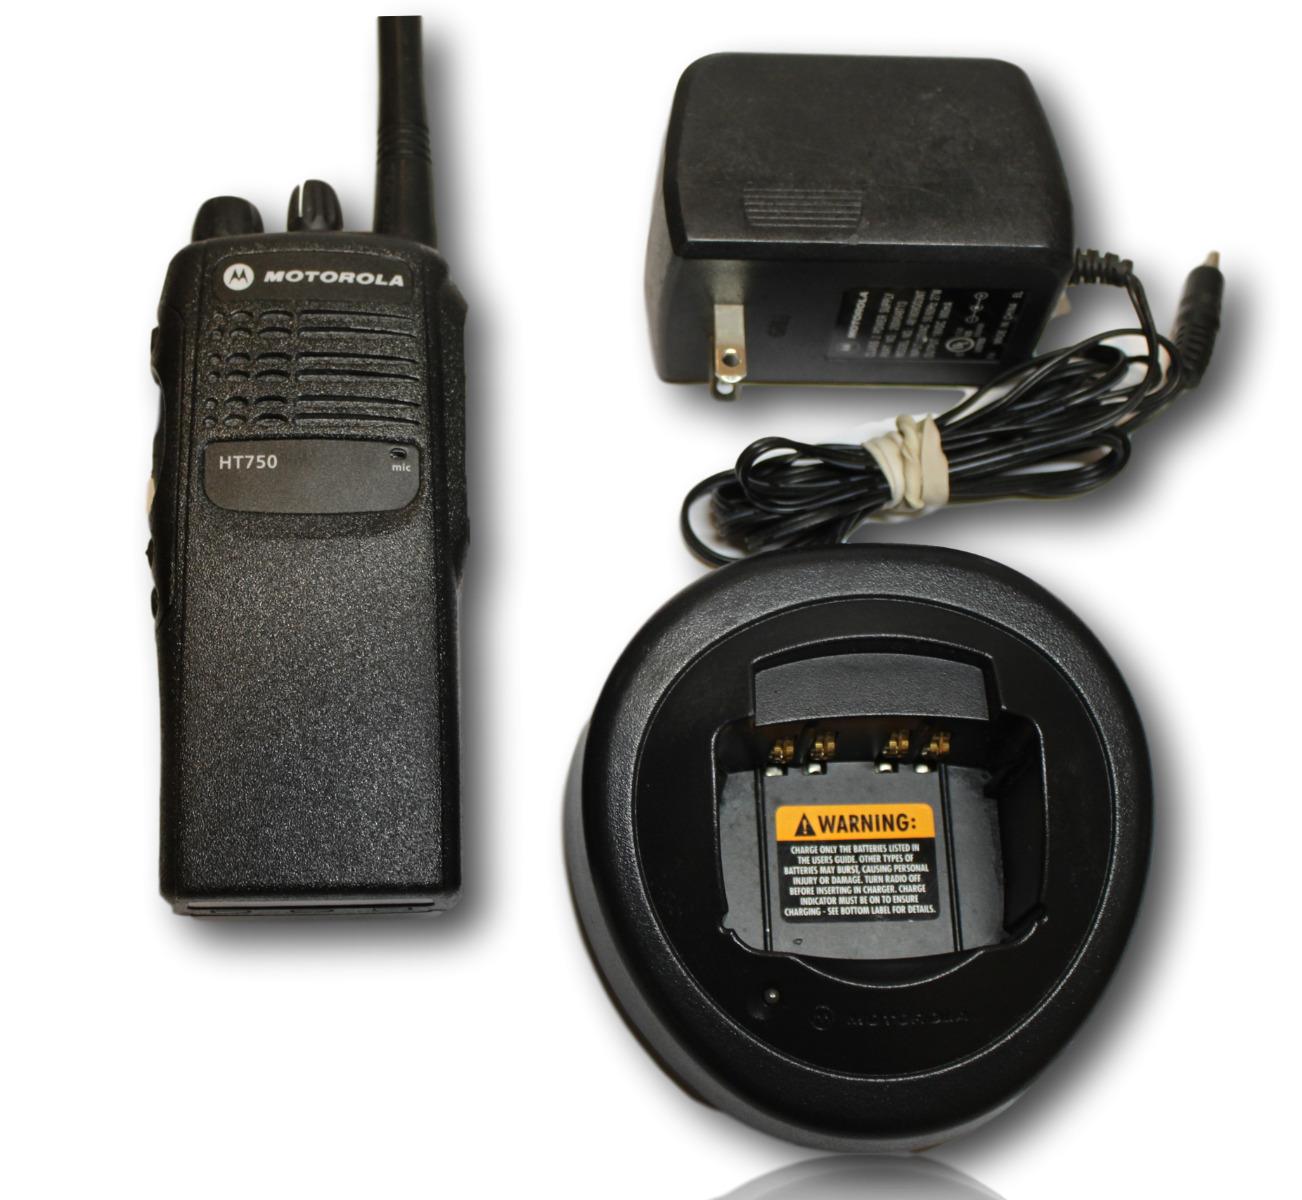 MOTOROLA HT750 VHF 136-174 MHZ 16CH  5 WATT RADIO With Charger And  Speaker Mic